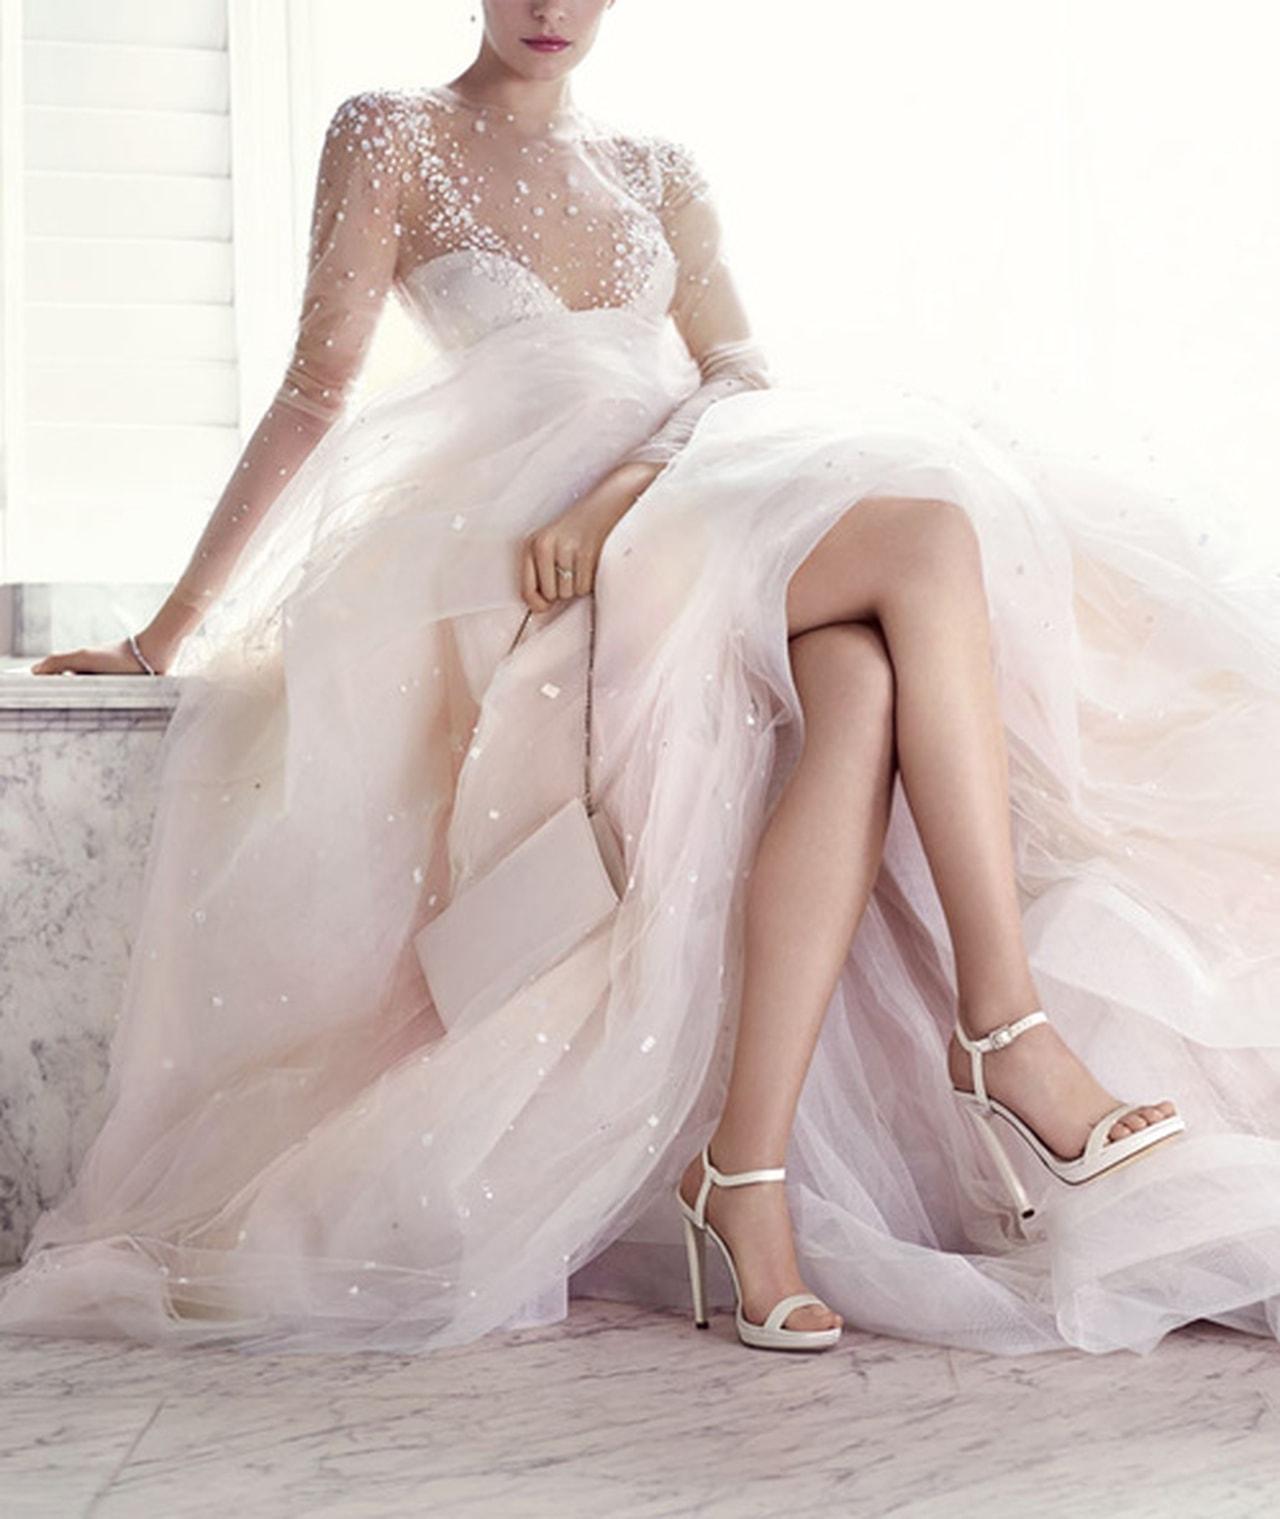 بالصور رمزيات عروس , رمزيات عروس كيوت جديده 3642 15